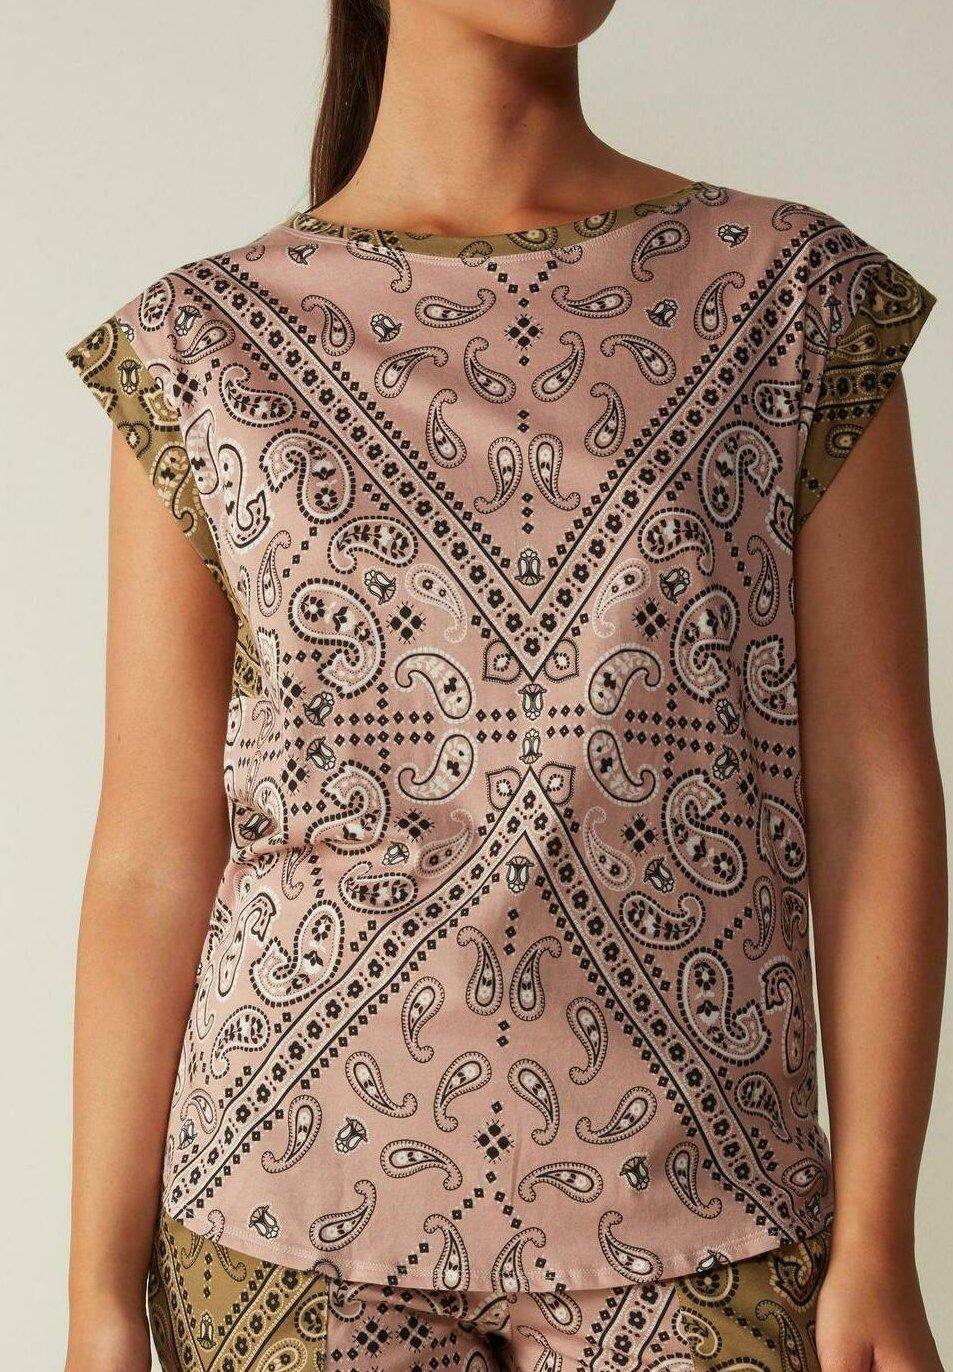 Damen KURZARMSHIRT AUS ULTRAFRESH BANDANA MANIA - Nachtwäsche Shirt